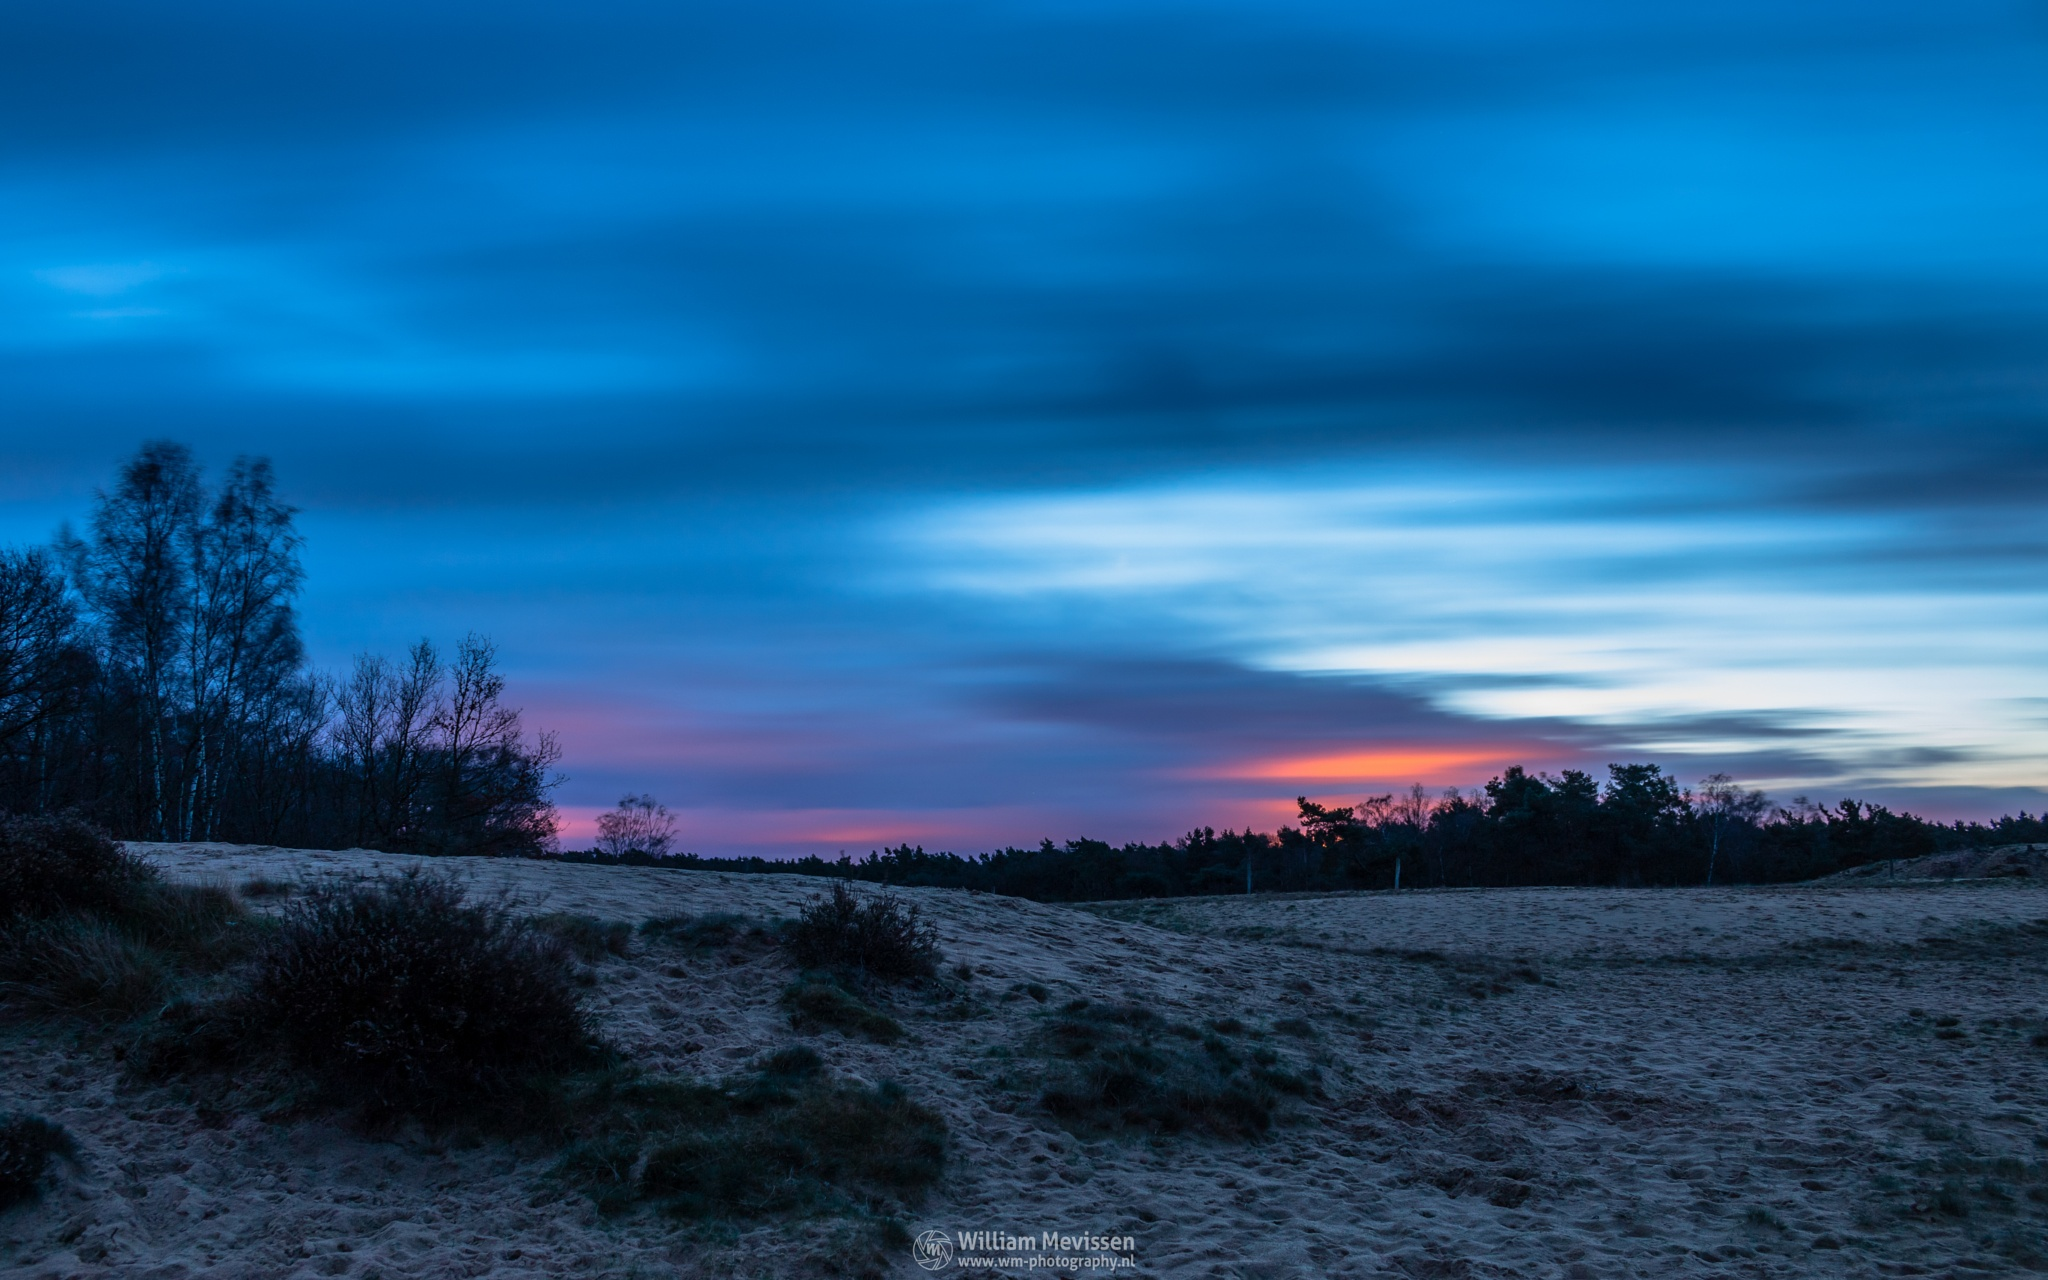 Photo in Landscape #bergerheide #forest #woods #heathland #maasduinen #limburg #noord-limburg #nieuw-bergen #bergen #national park #nature #sand #dunes #sanddunes #tree #trees #sky #clouds #twilight #dawn #le #long exposure #80 seconds